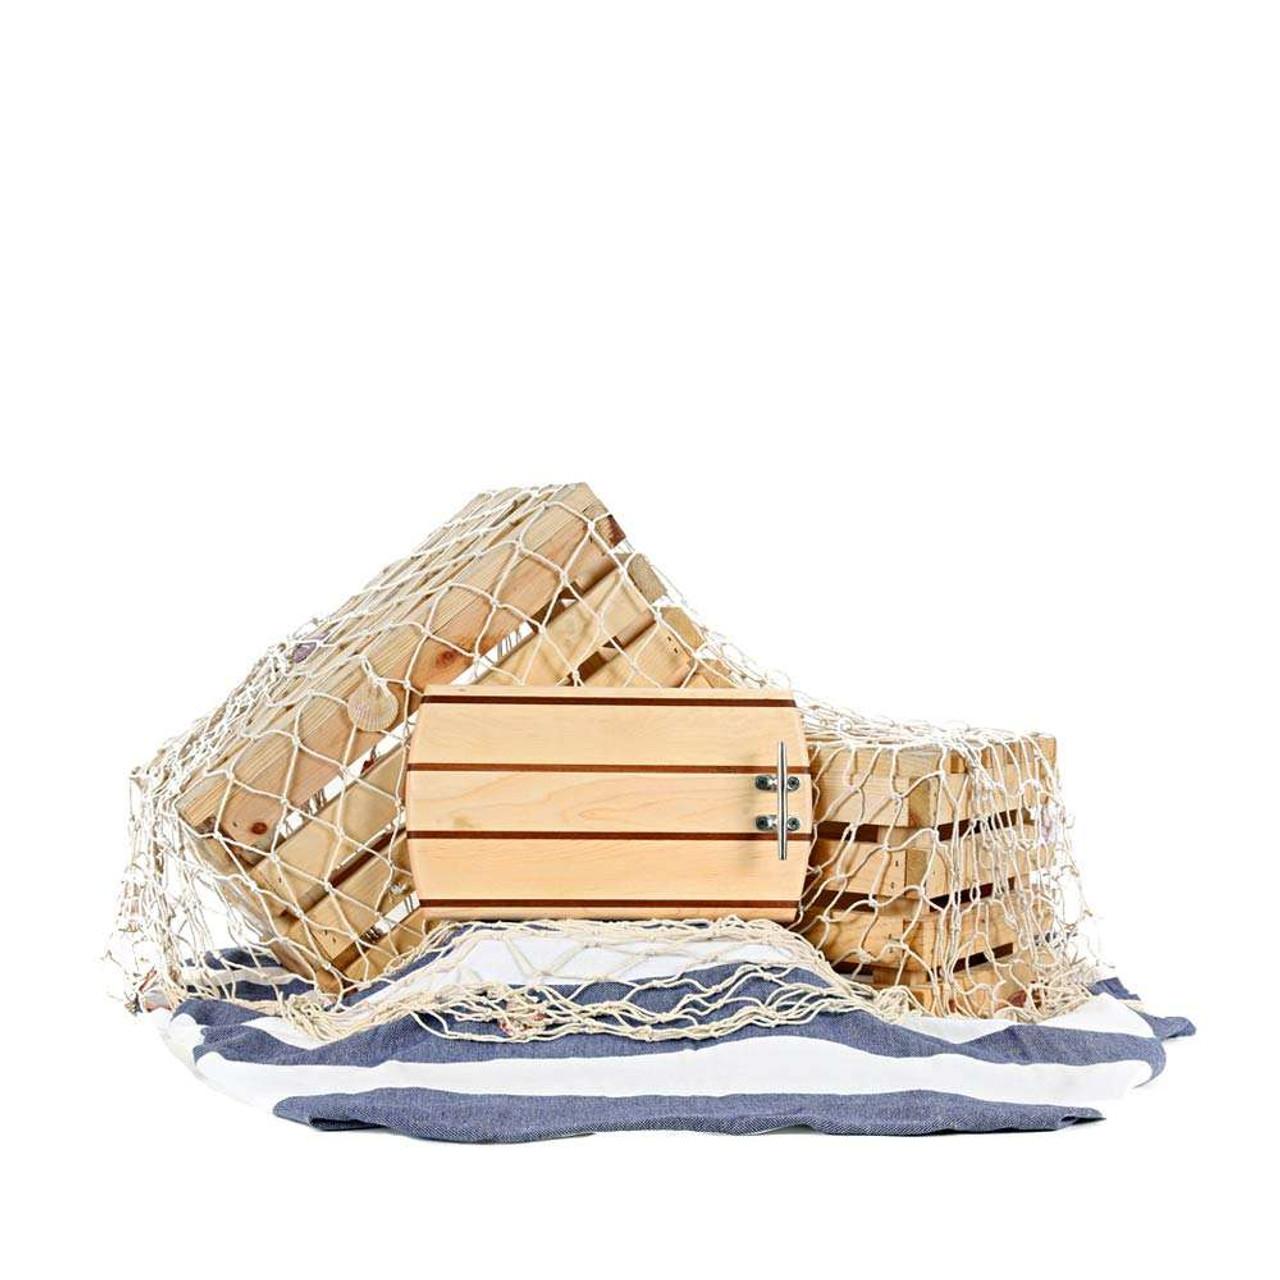 Small Rectangle Maple Cheese Board Nautical Boards